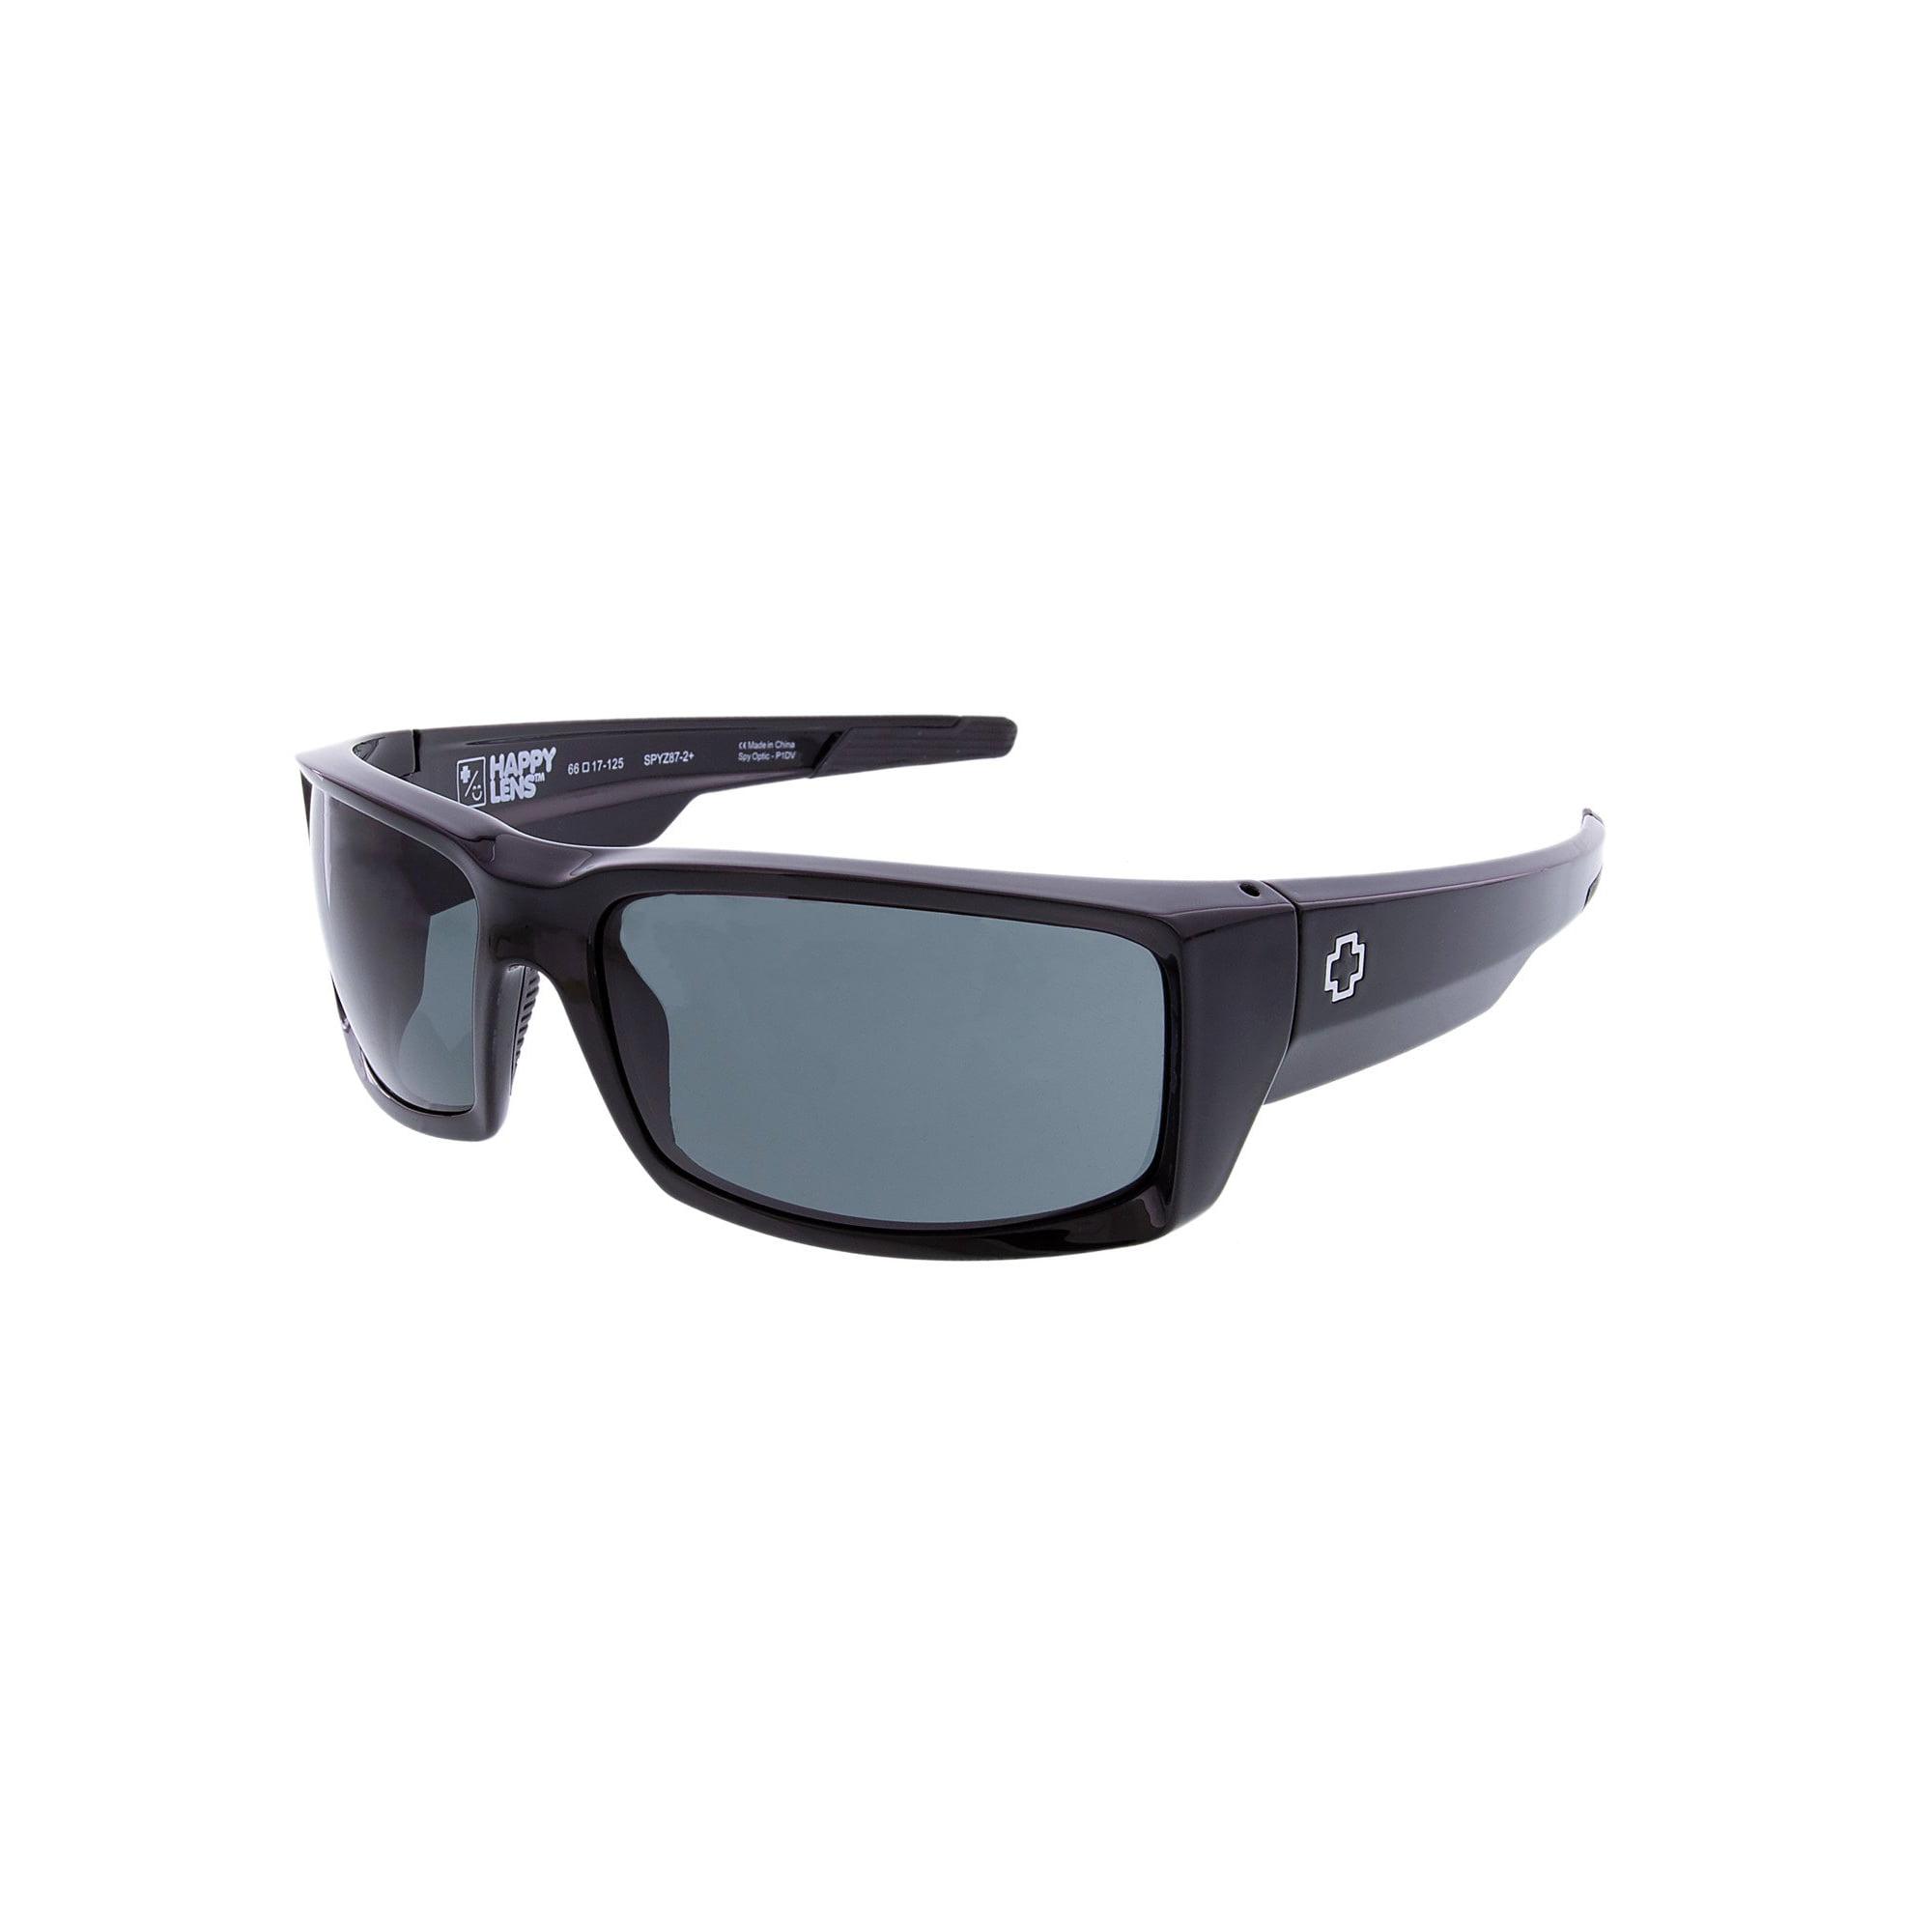 16f4834d4 Spy Sunglasses General Lens Scratch Resistant Lenses Wrap Athletic, Black  Ansi RX | Walmart Canada